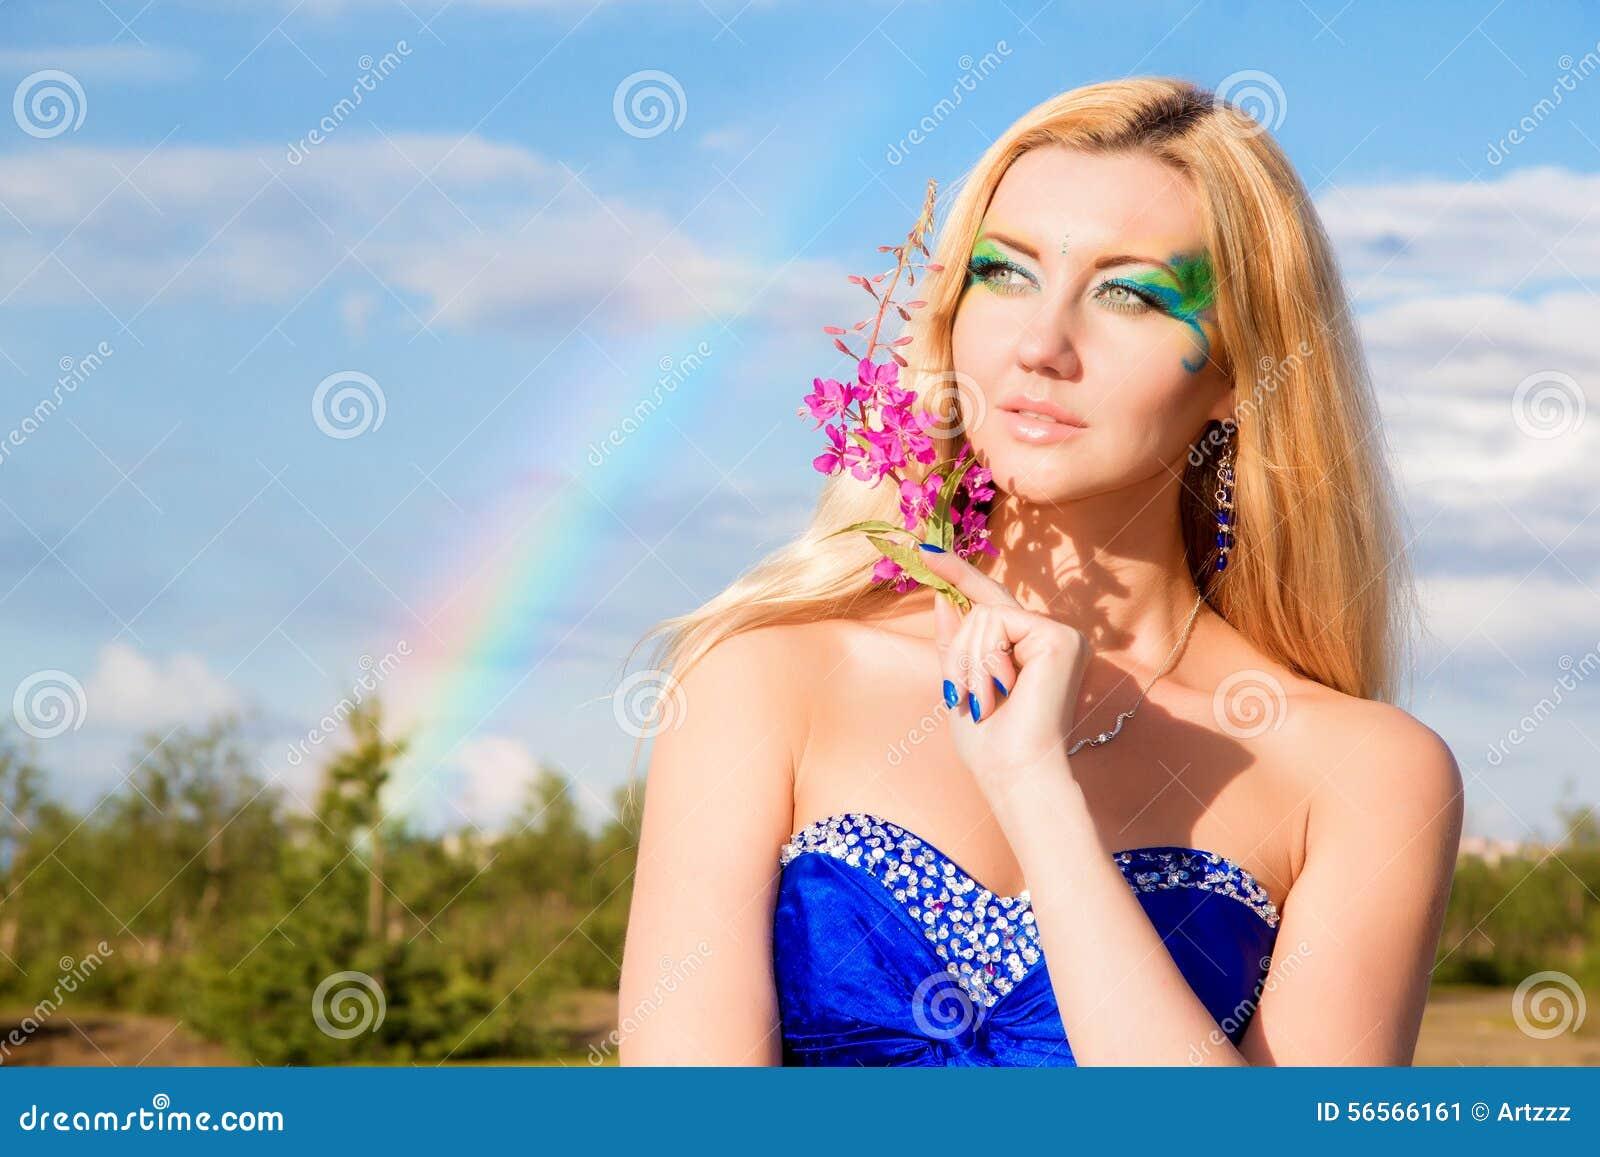 Download Αρκετά νέα γυναίκα στο υπόβαθρο του ουράνιου τόξου Στοκ Εικόνα - εικόνα από ευχαρίστηση, φόρεμα: 56566161